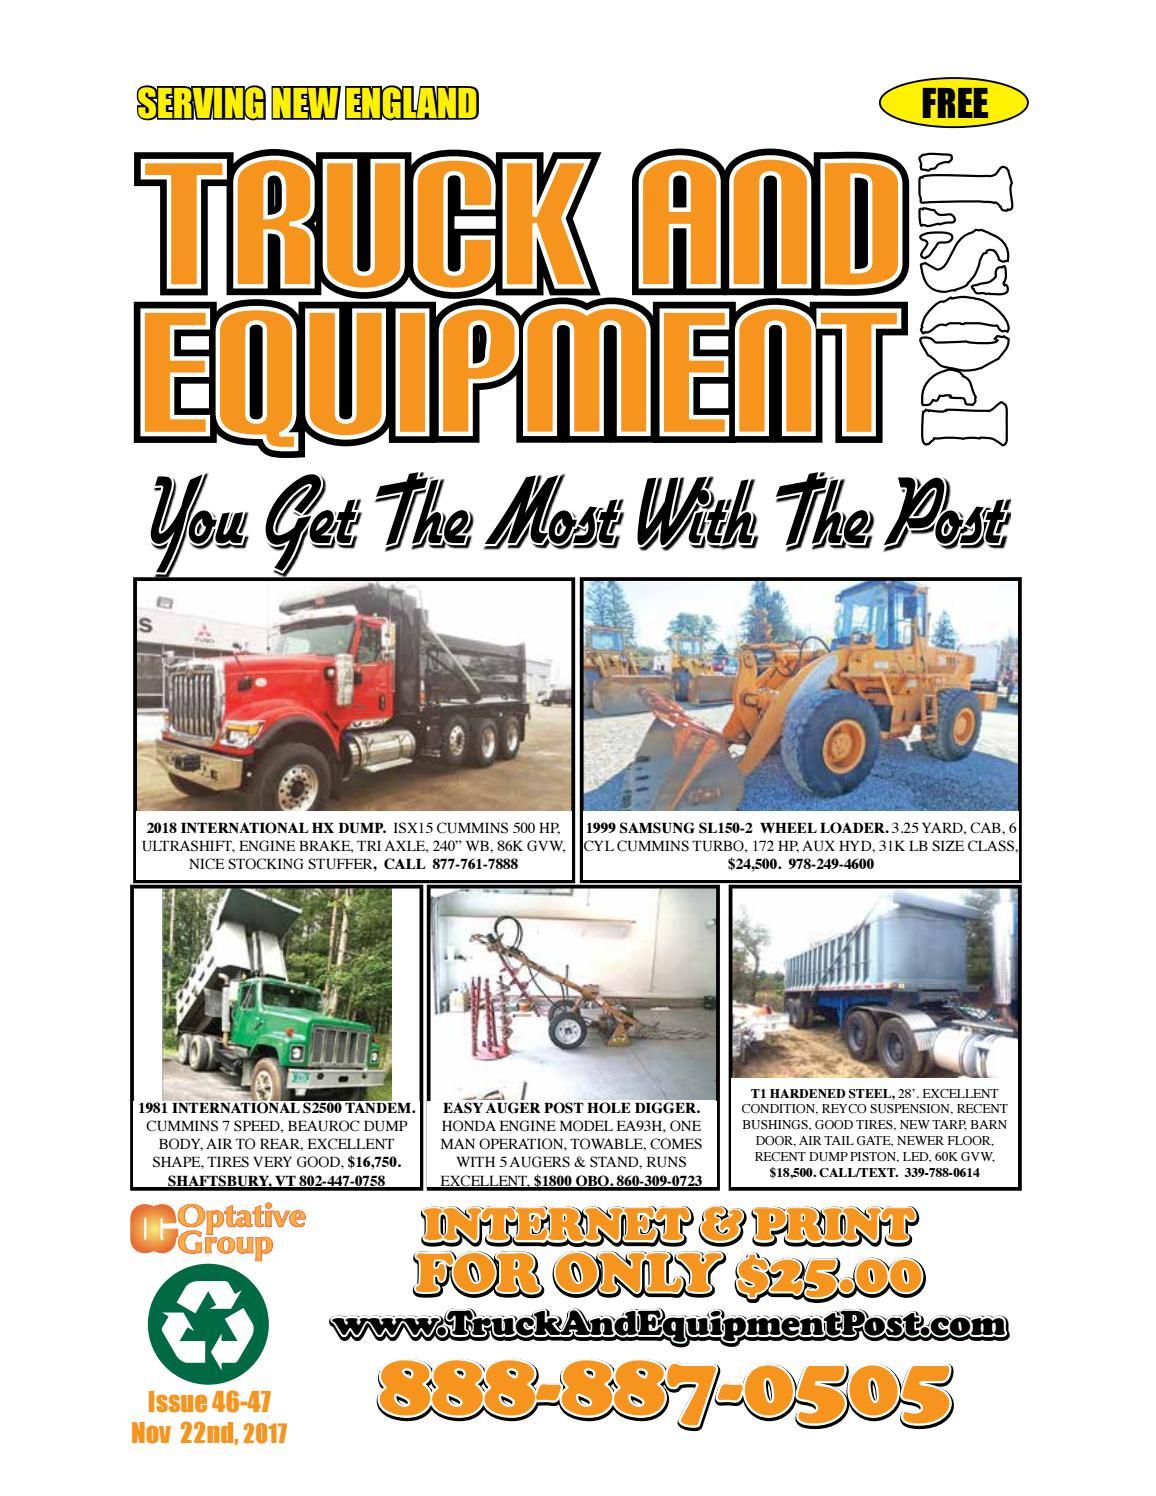 Truck equipment post 46 47 2017 by 1ClickAway - issuu